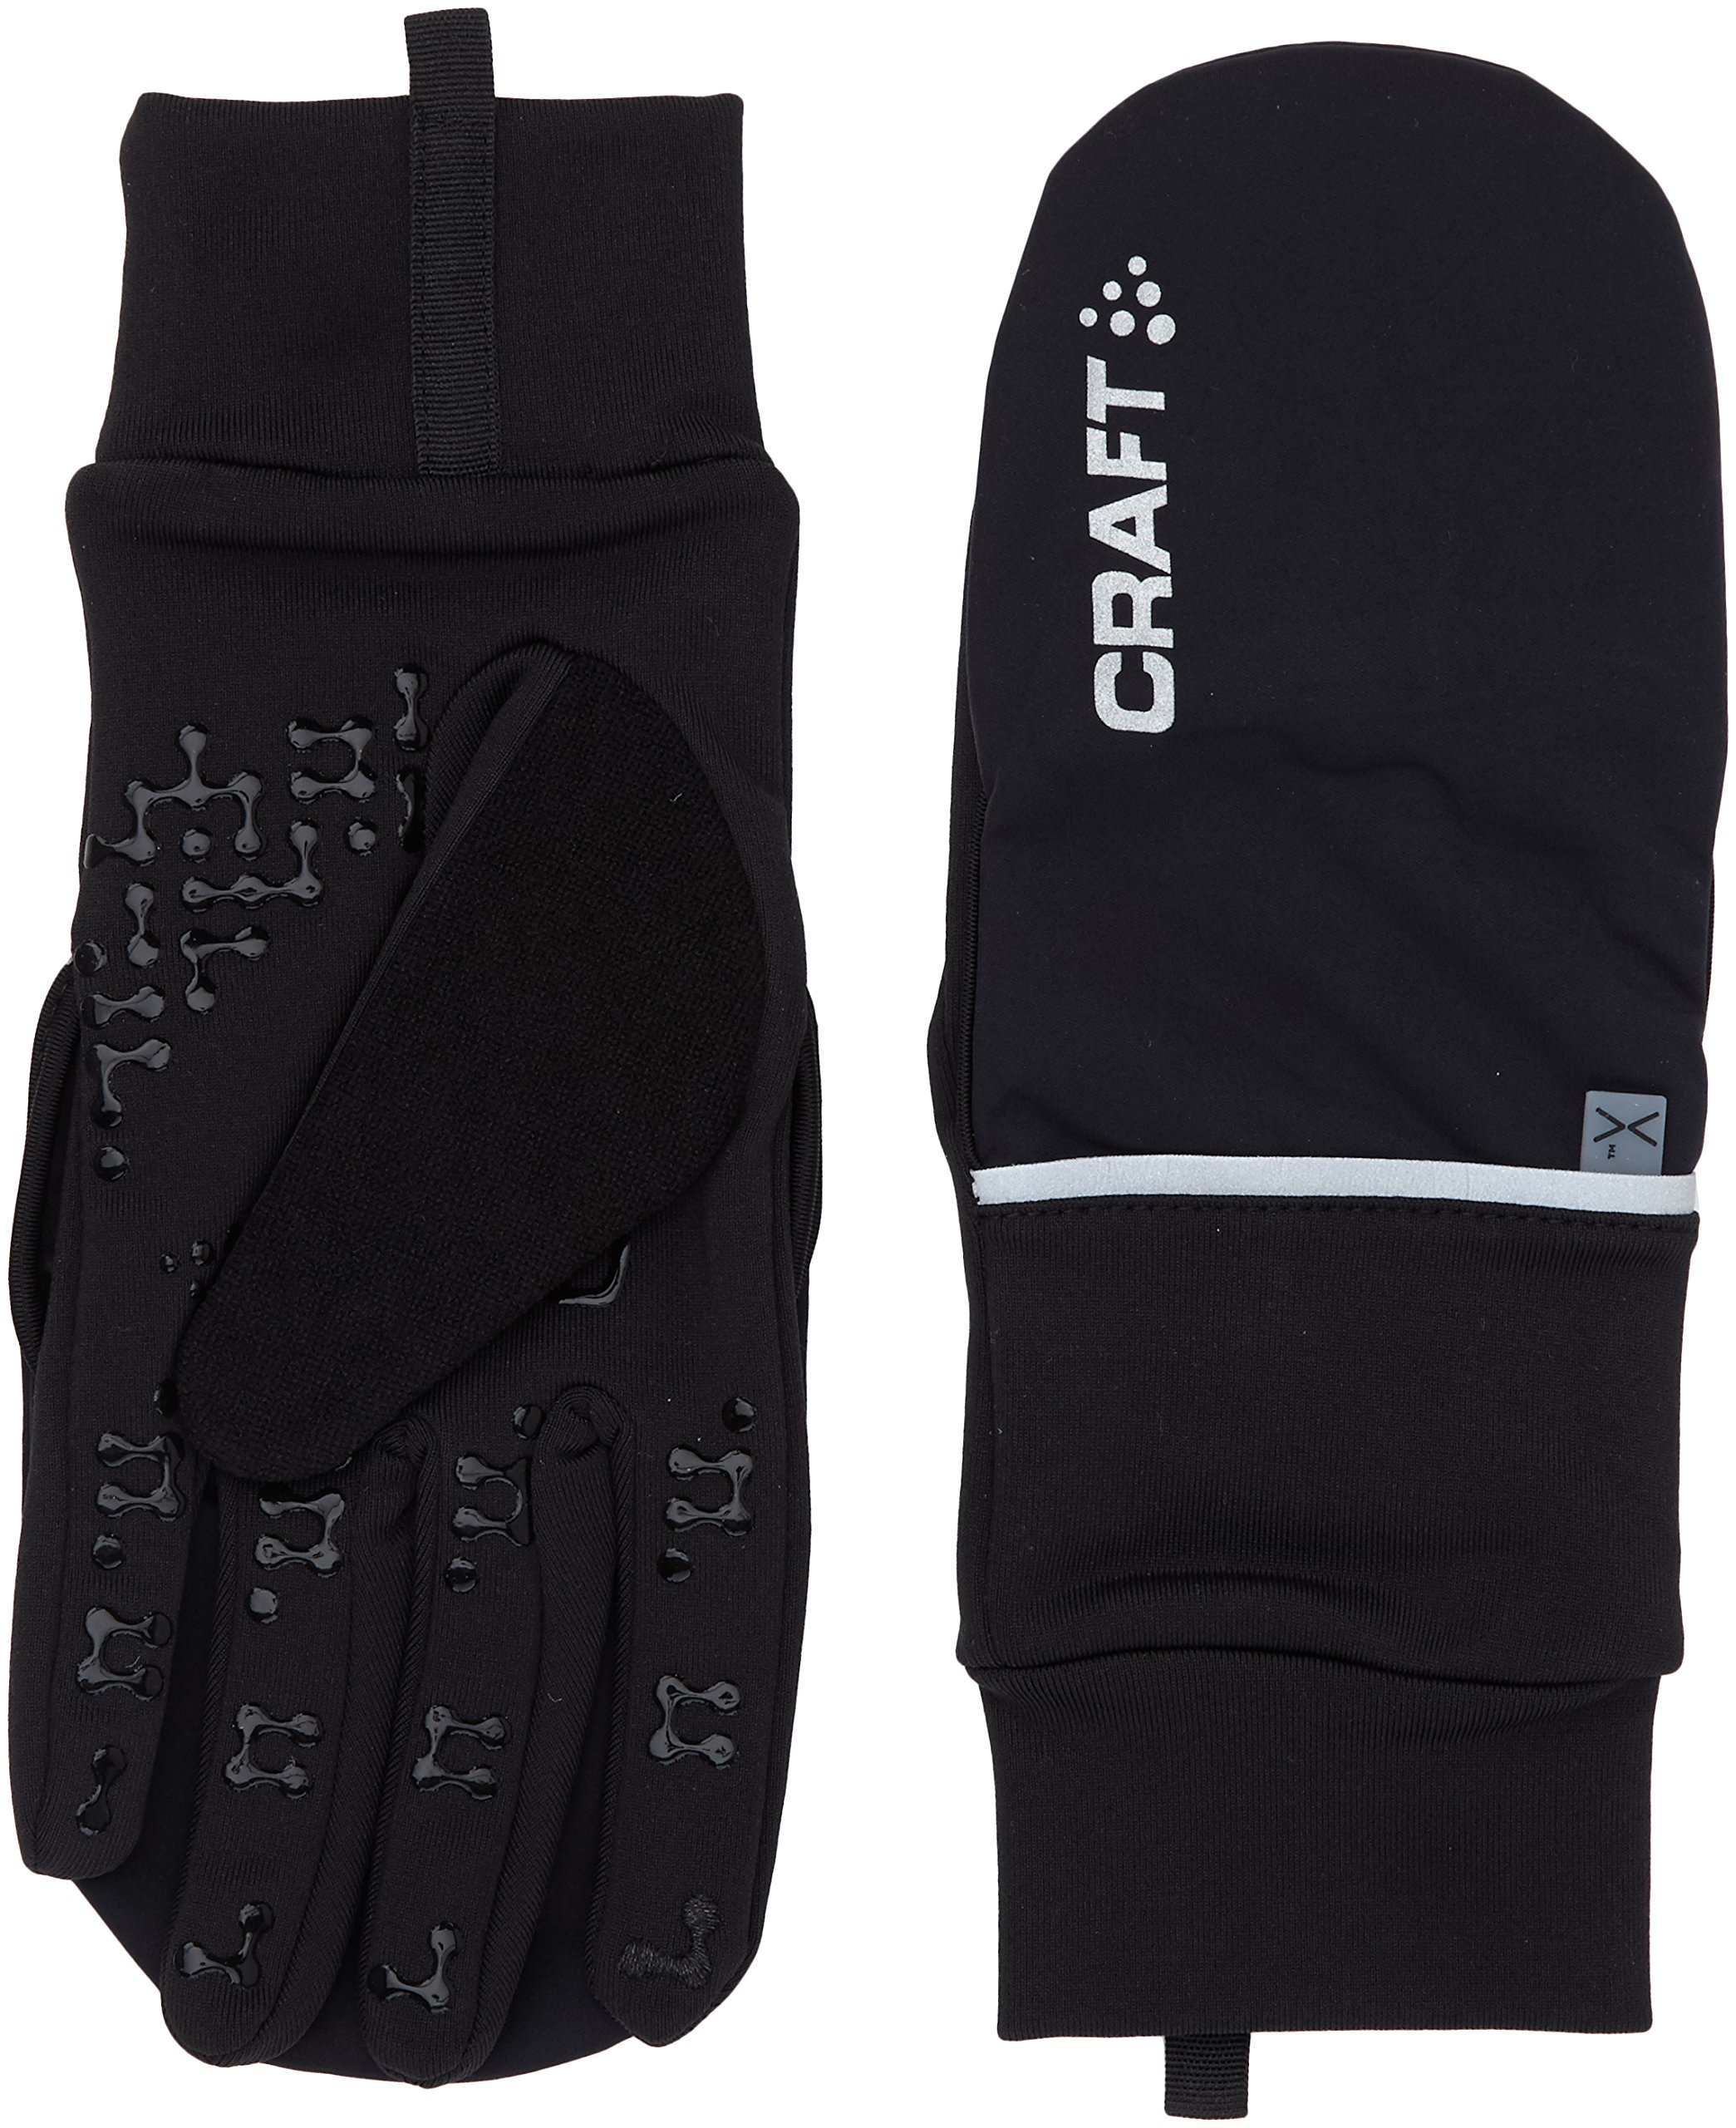 Craft Sportswear Hybrid Weather 2-in-1 Bike Cycling Mitten Glove, Black, X-Large